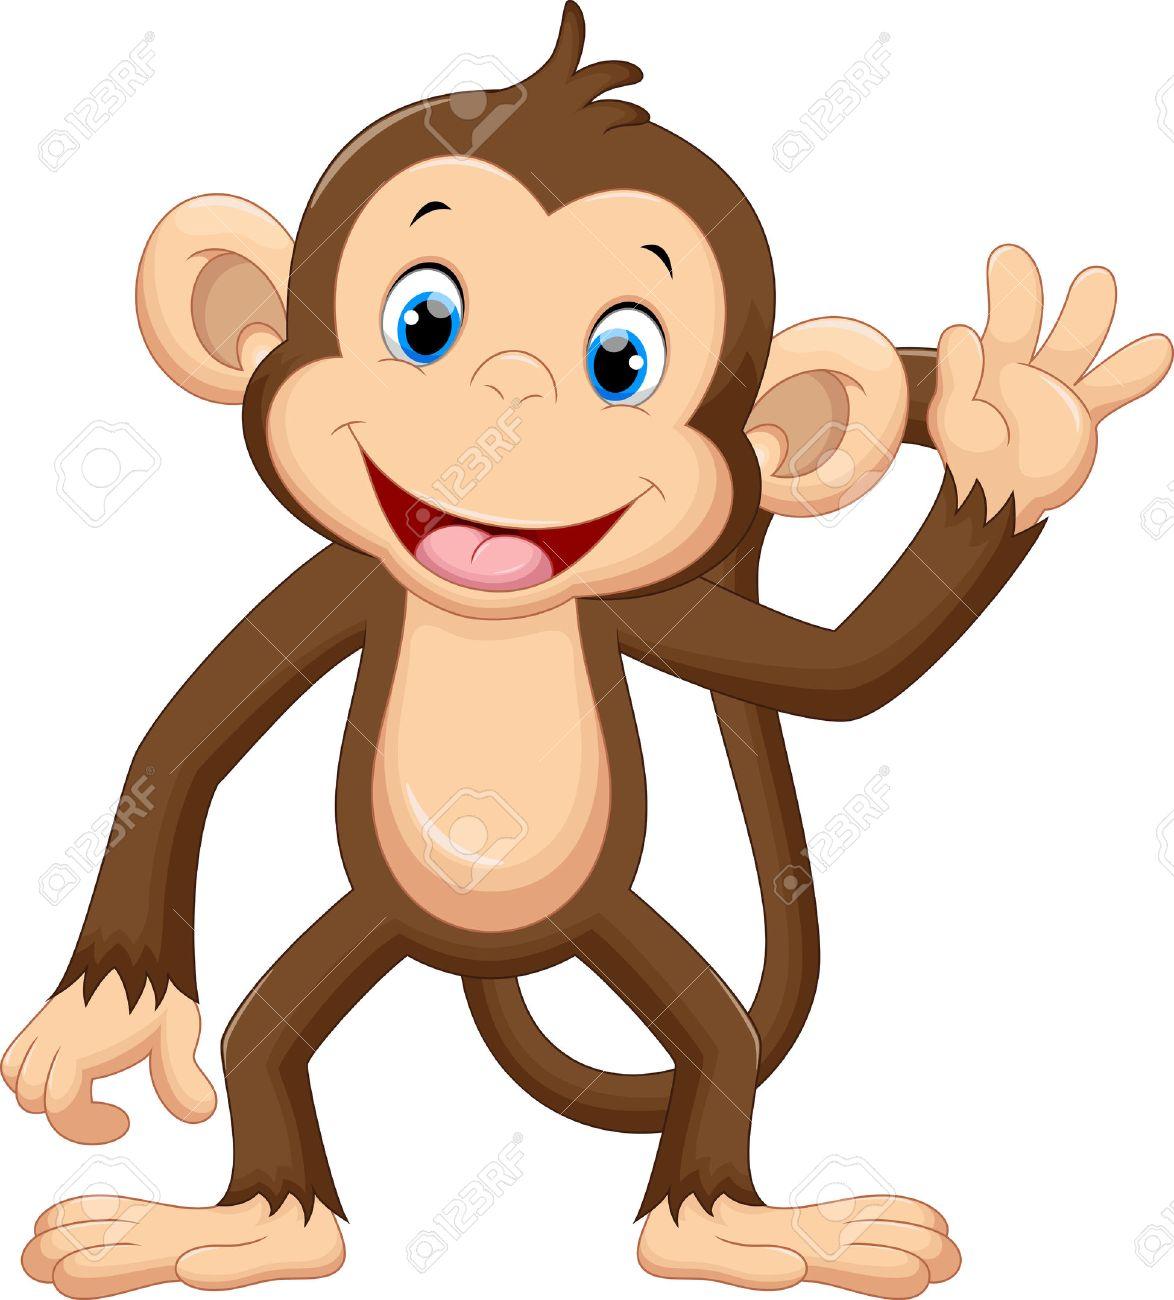 Cute Monkey Waving Royalty Free Cliparts Vectors And Stock Illustration Image 50993720